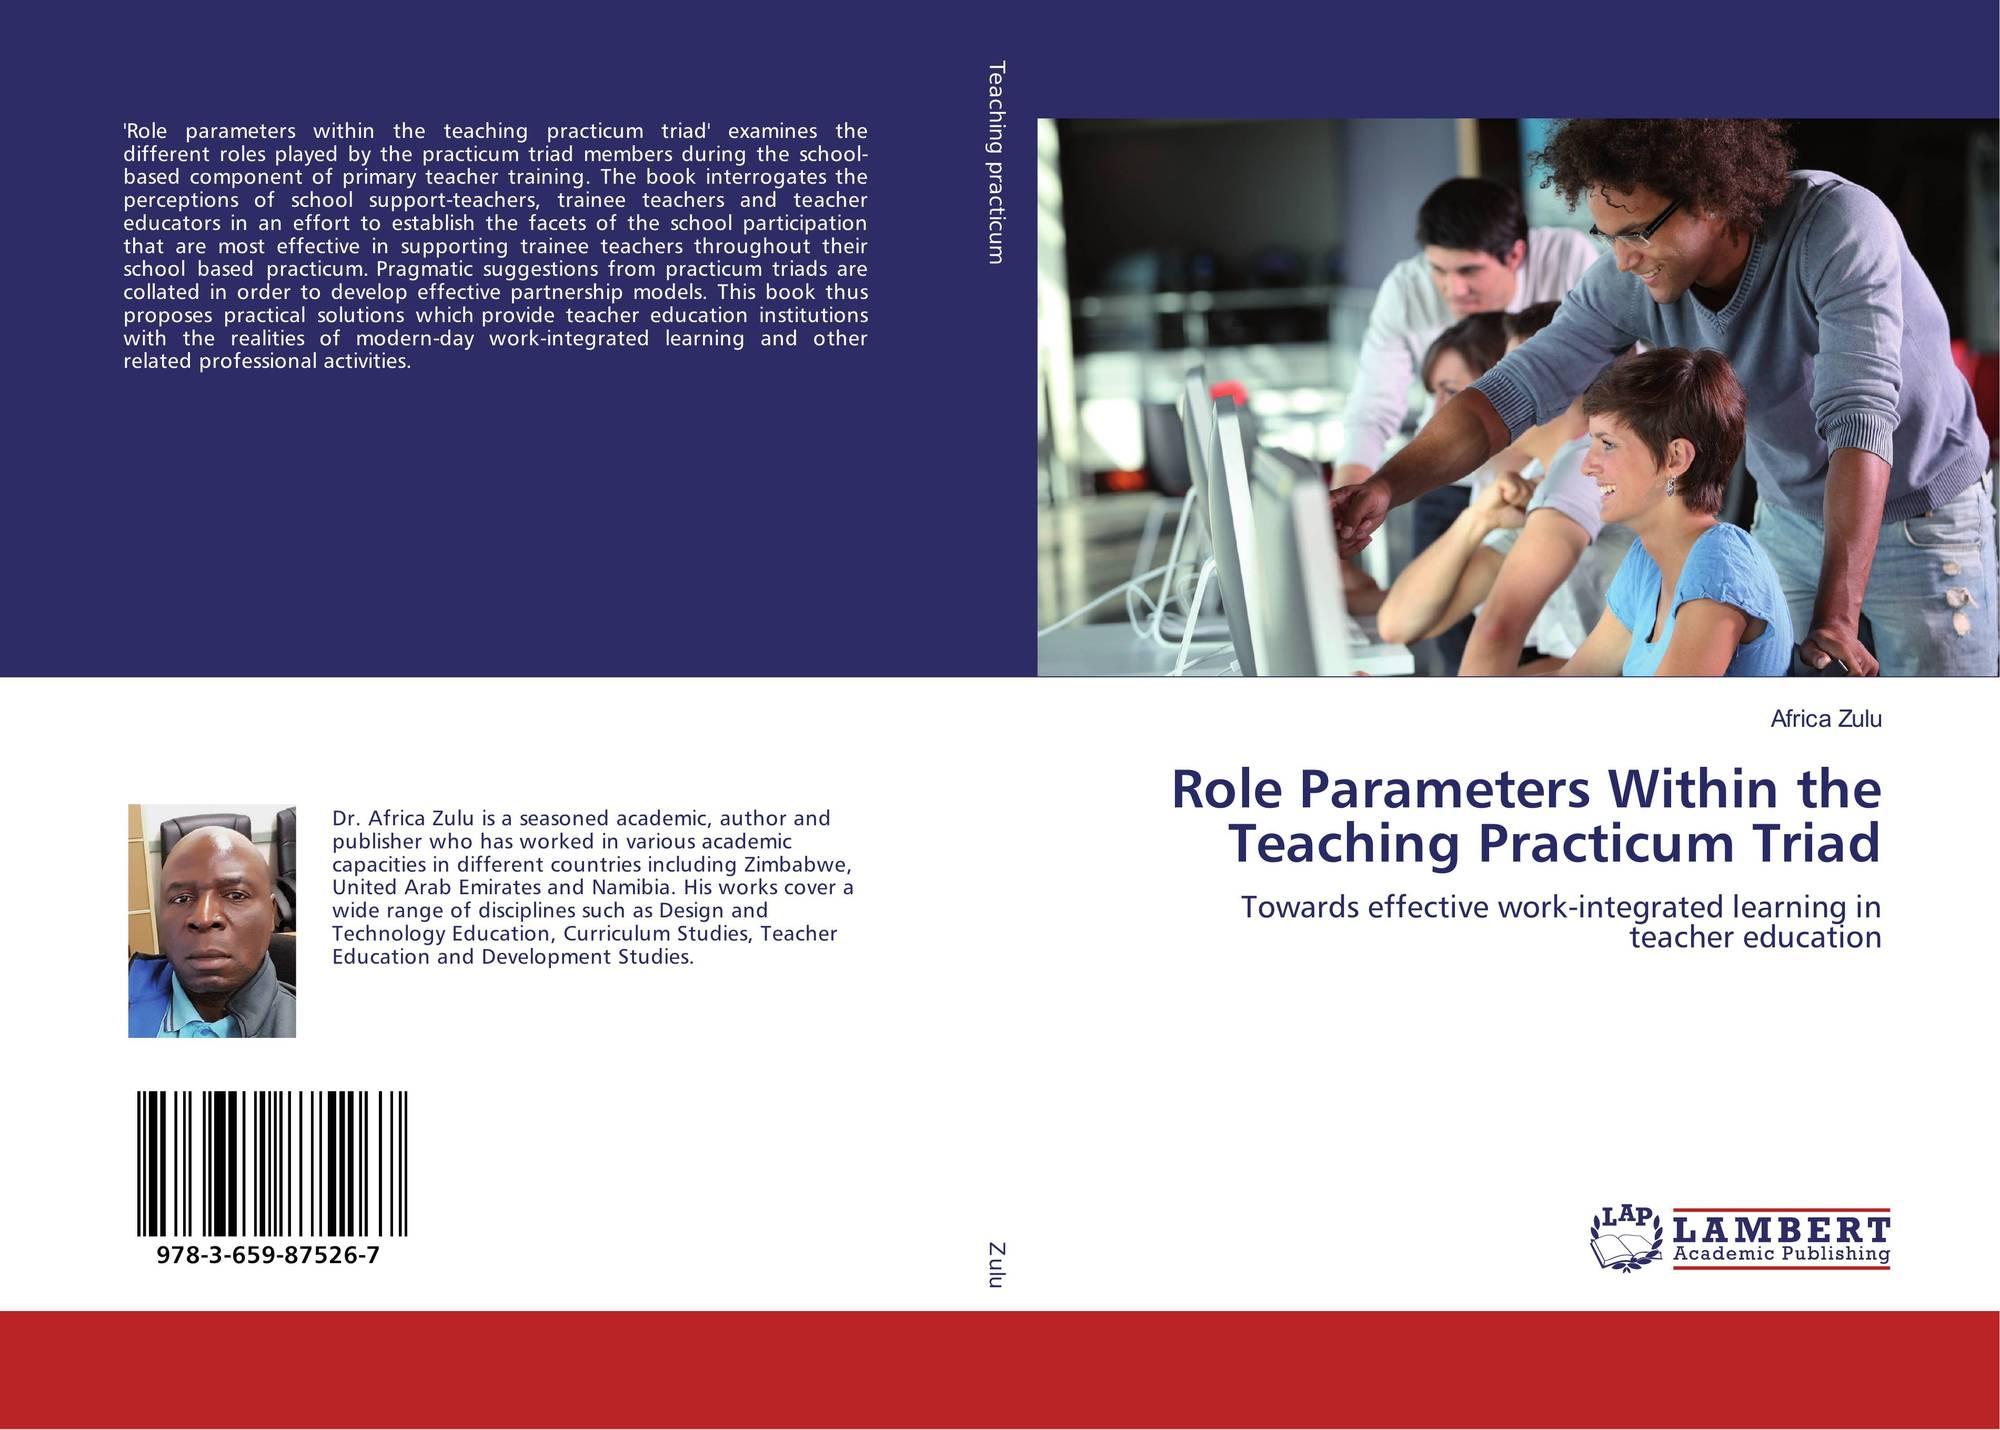 the role of technical teacher education